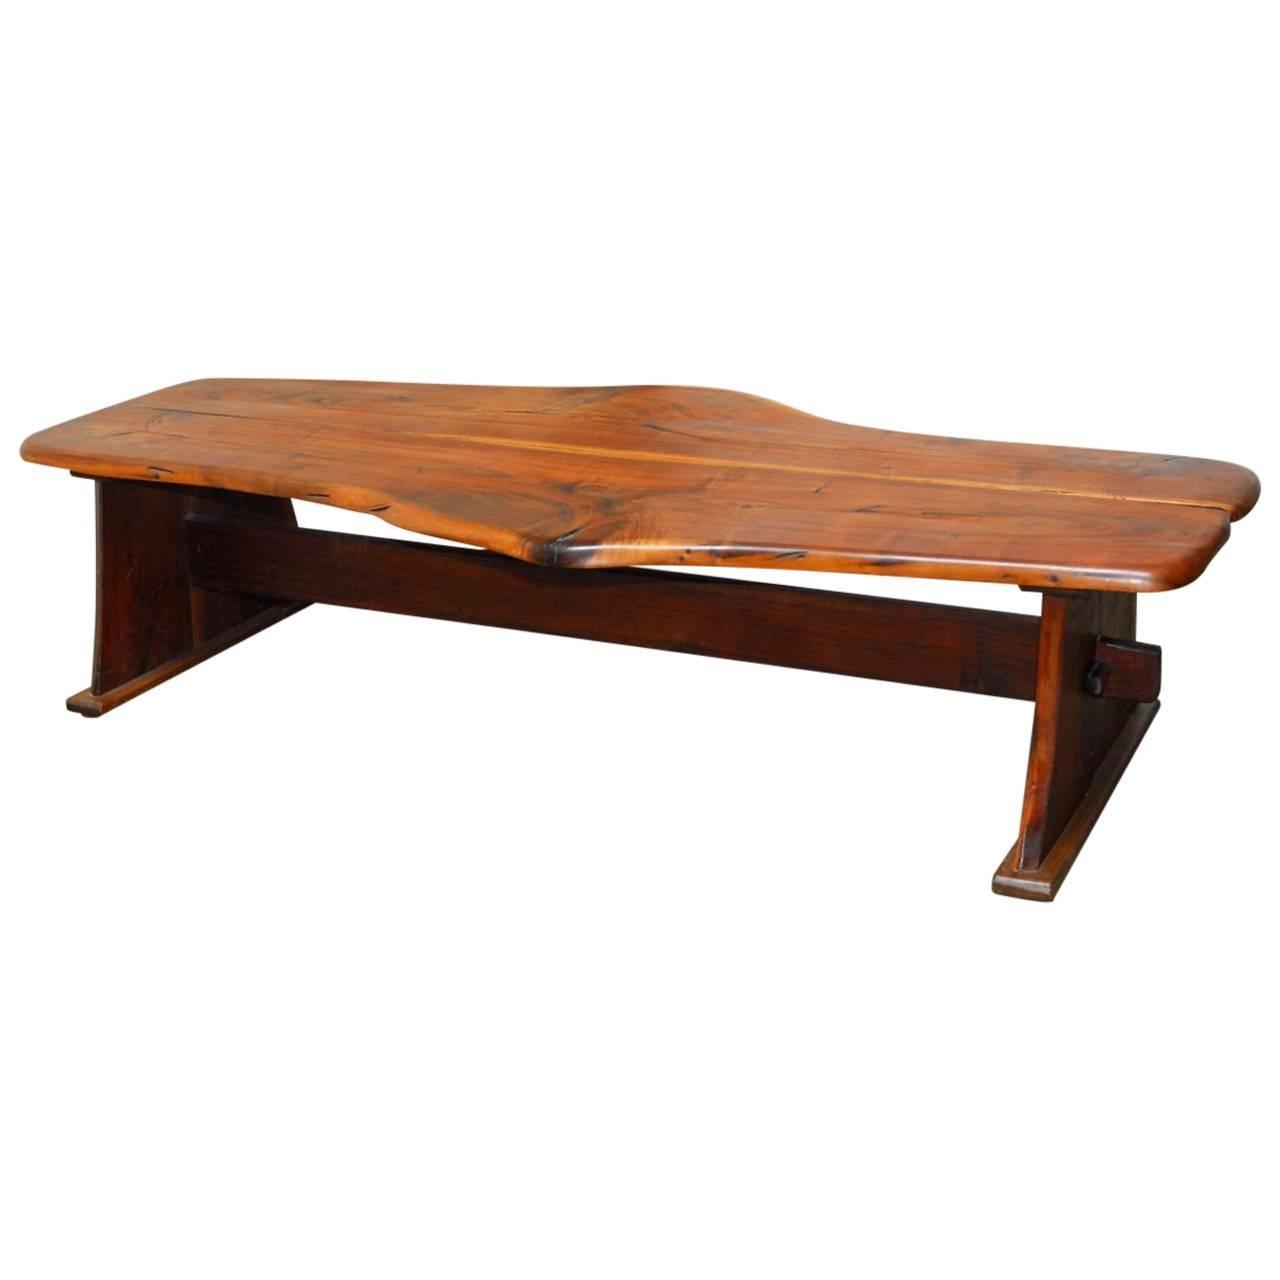 George Nakashima Inspired Natural Edge Walnut Bench Coffee Table